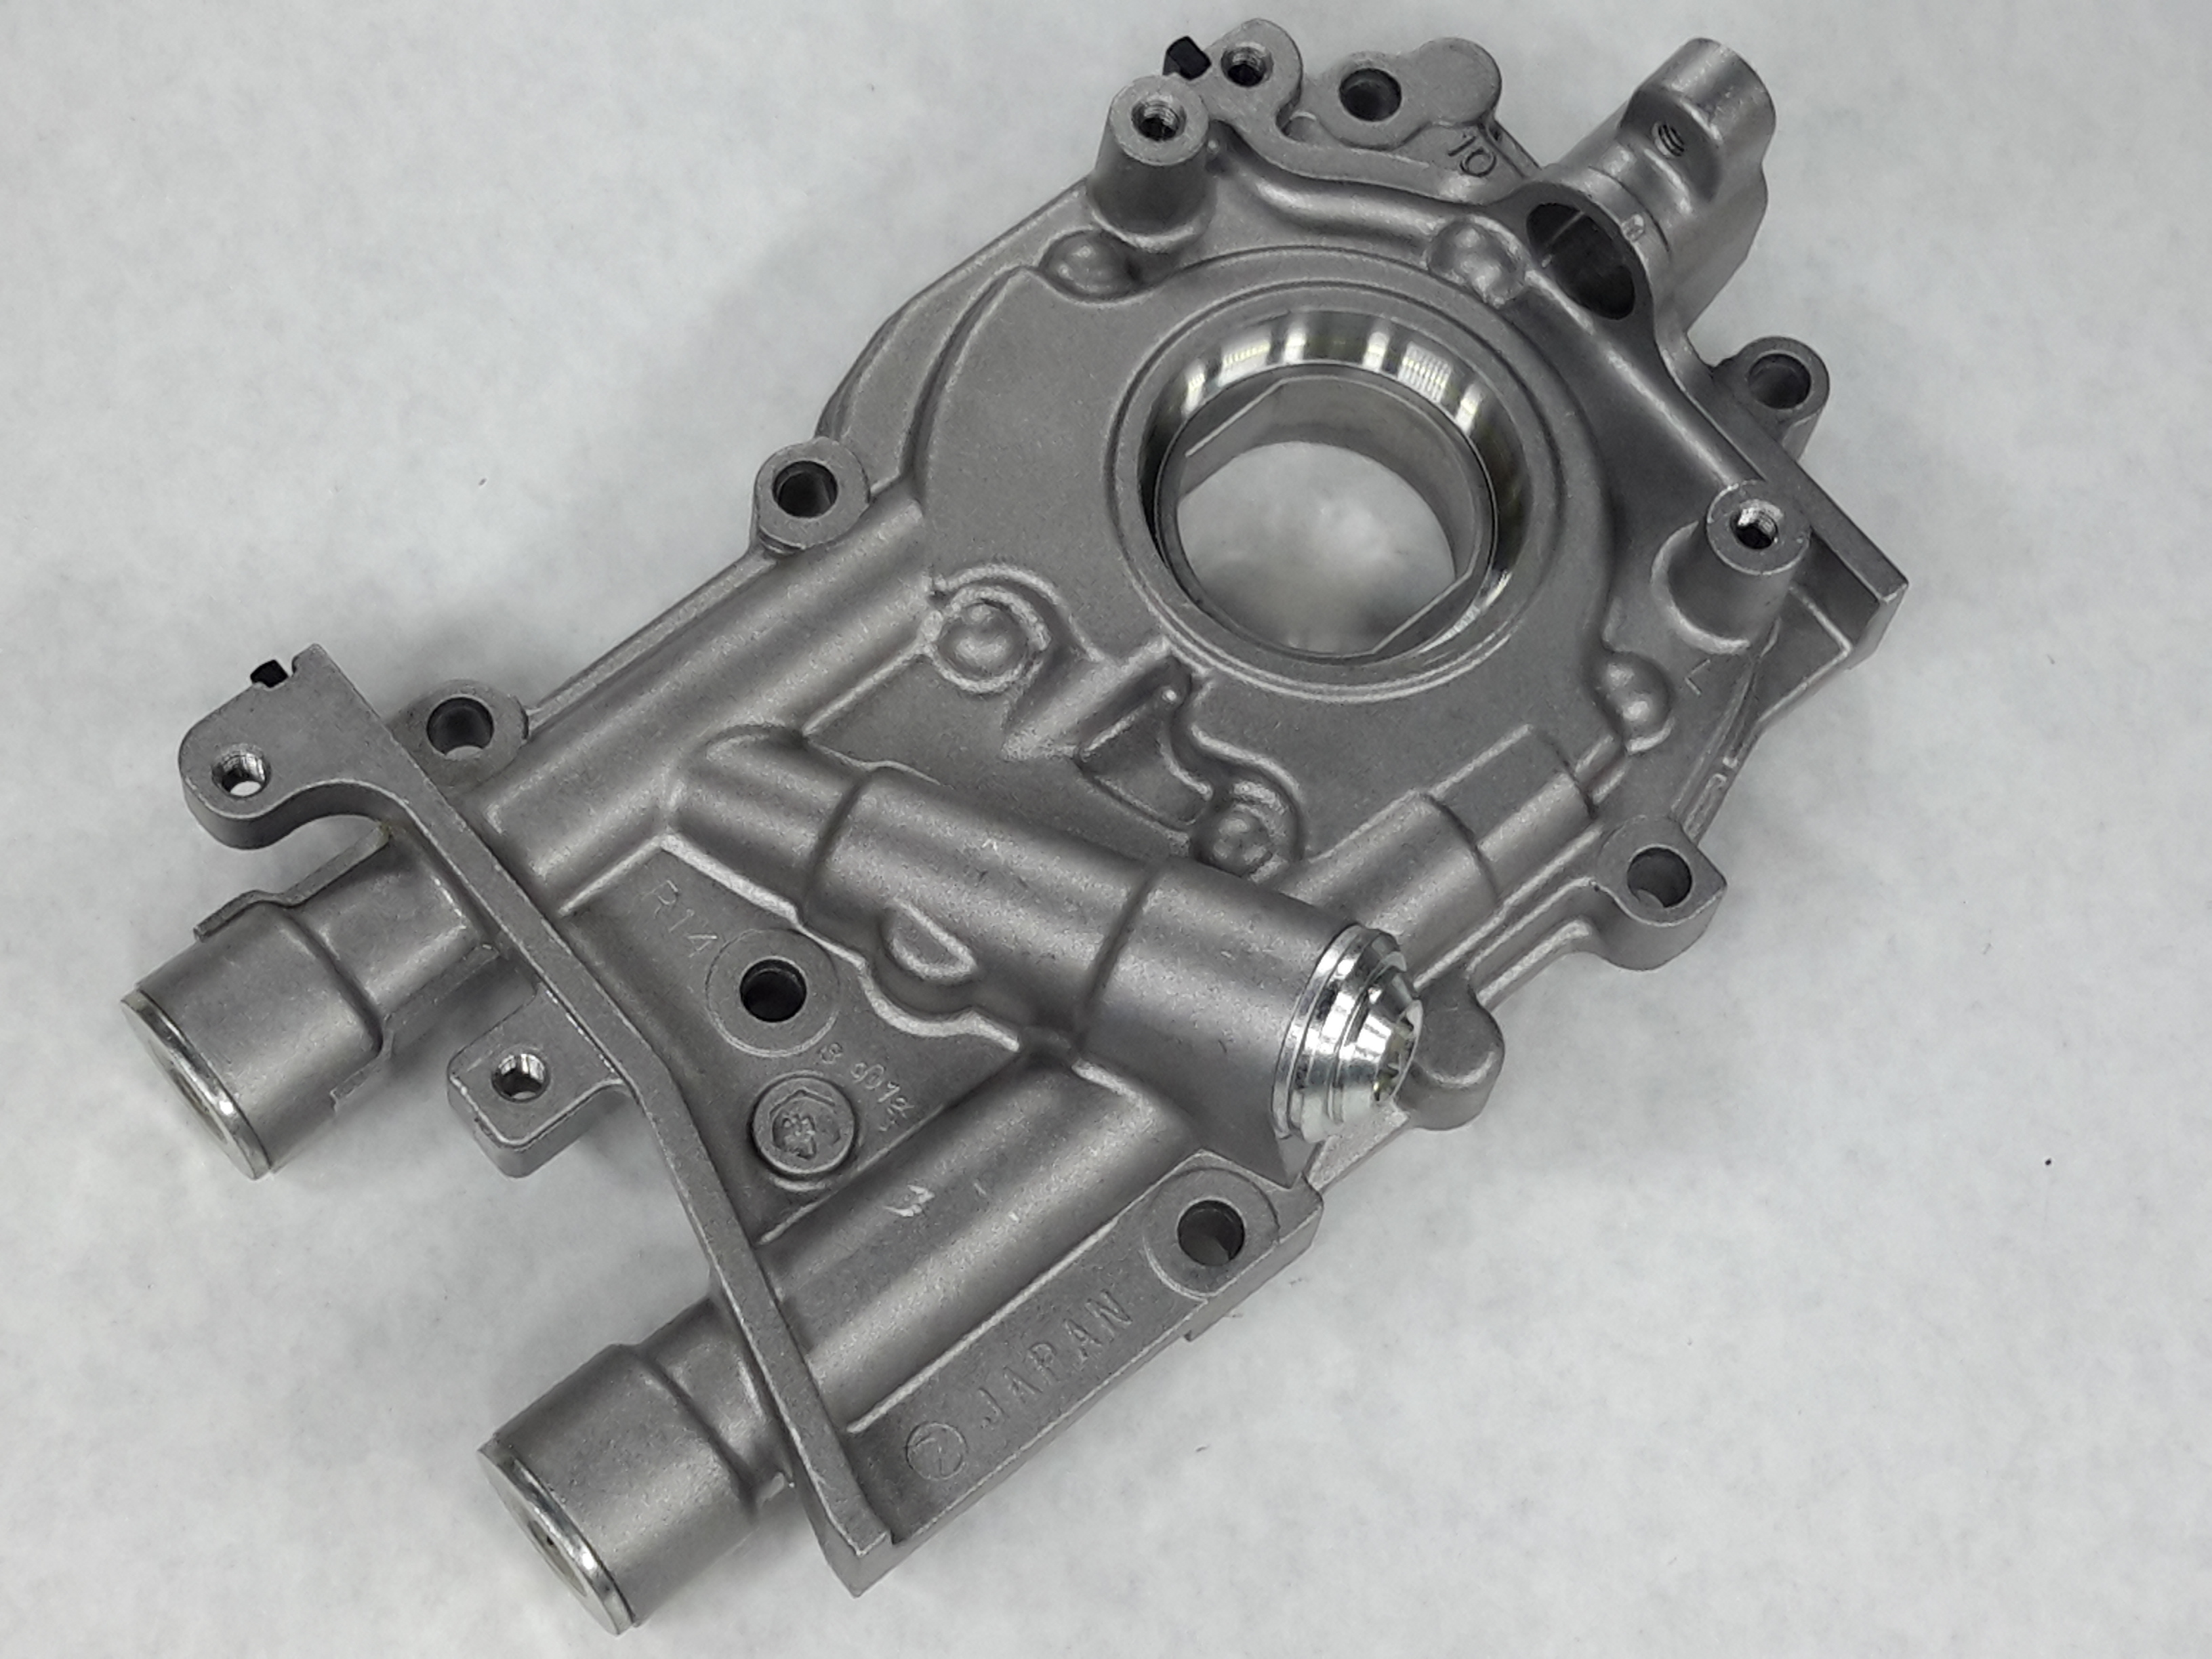 1994 Subaru Legacy Ignition Switch Wiring Diagrams Subaru Impreza Fuse